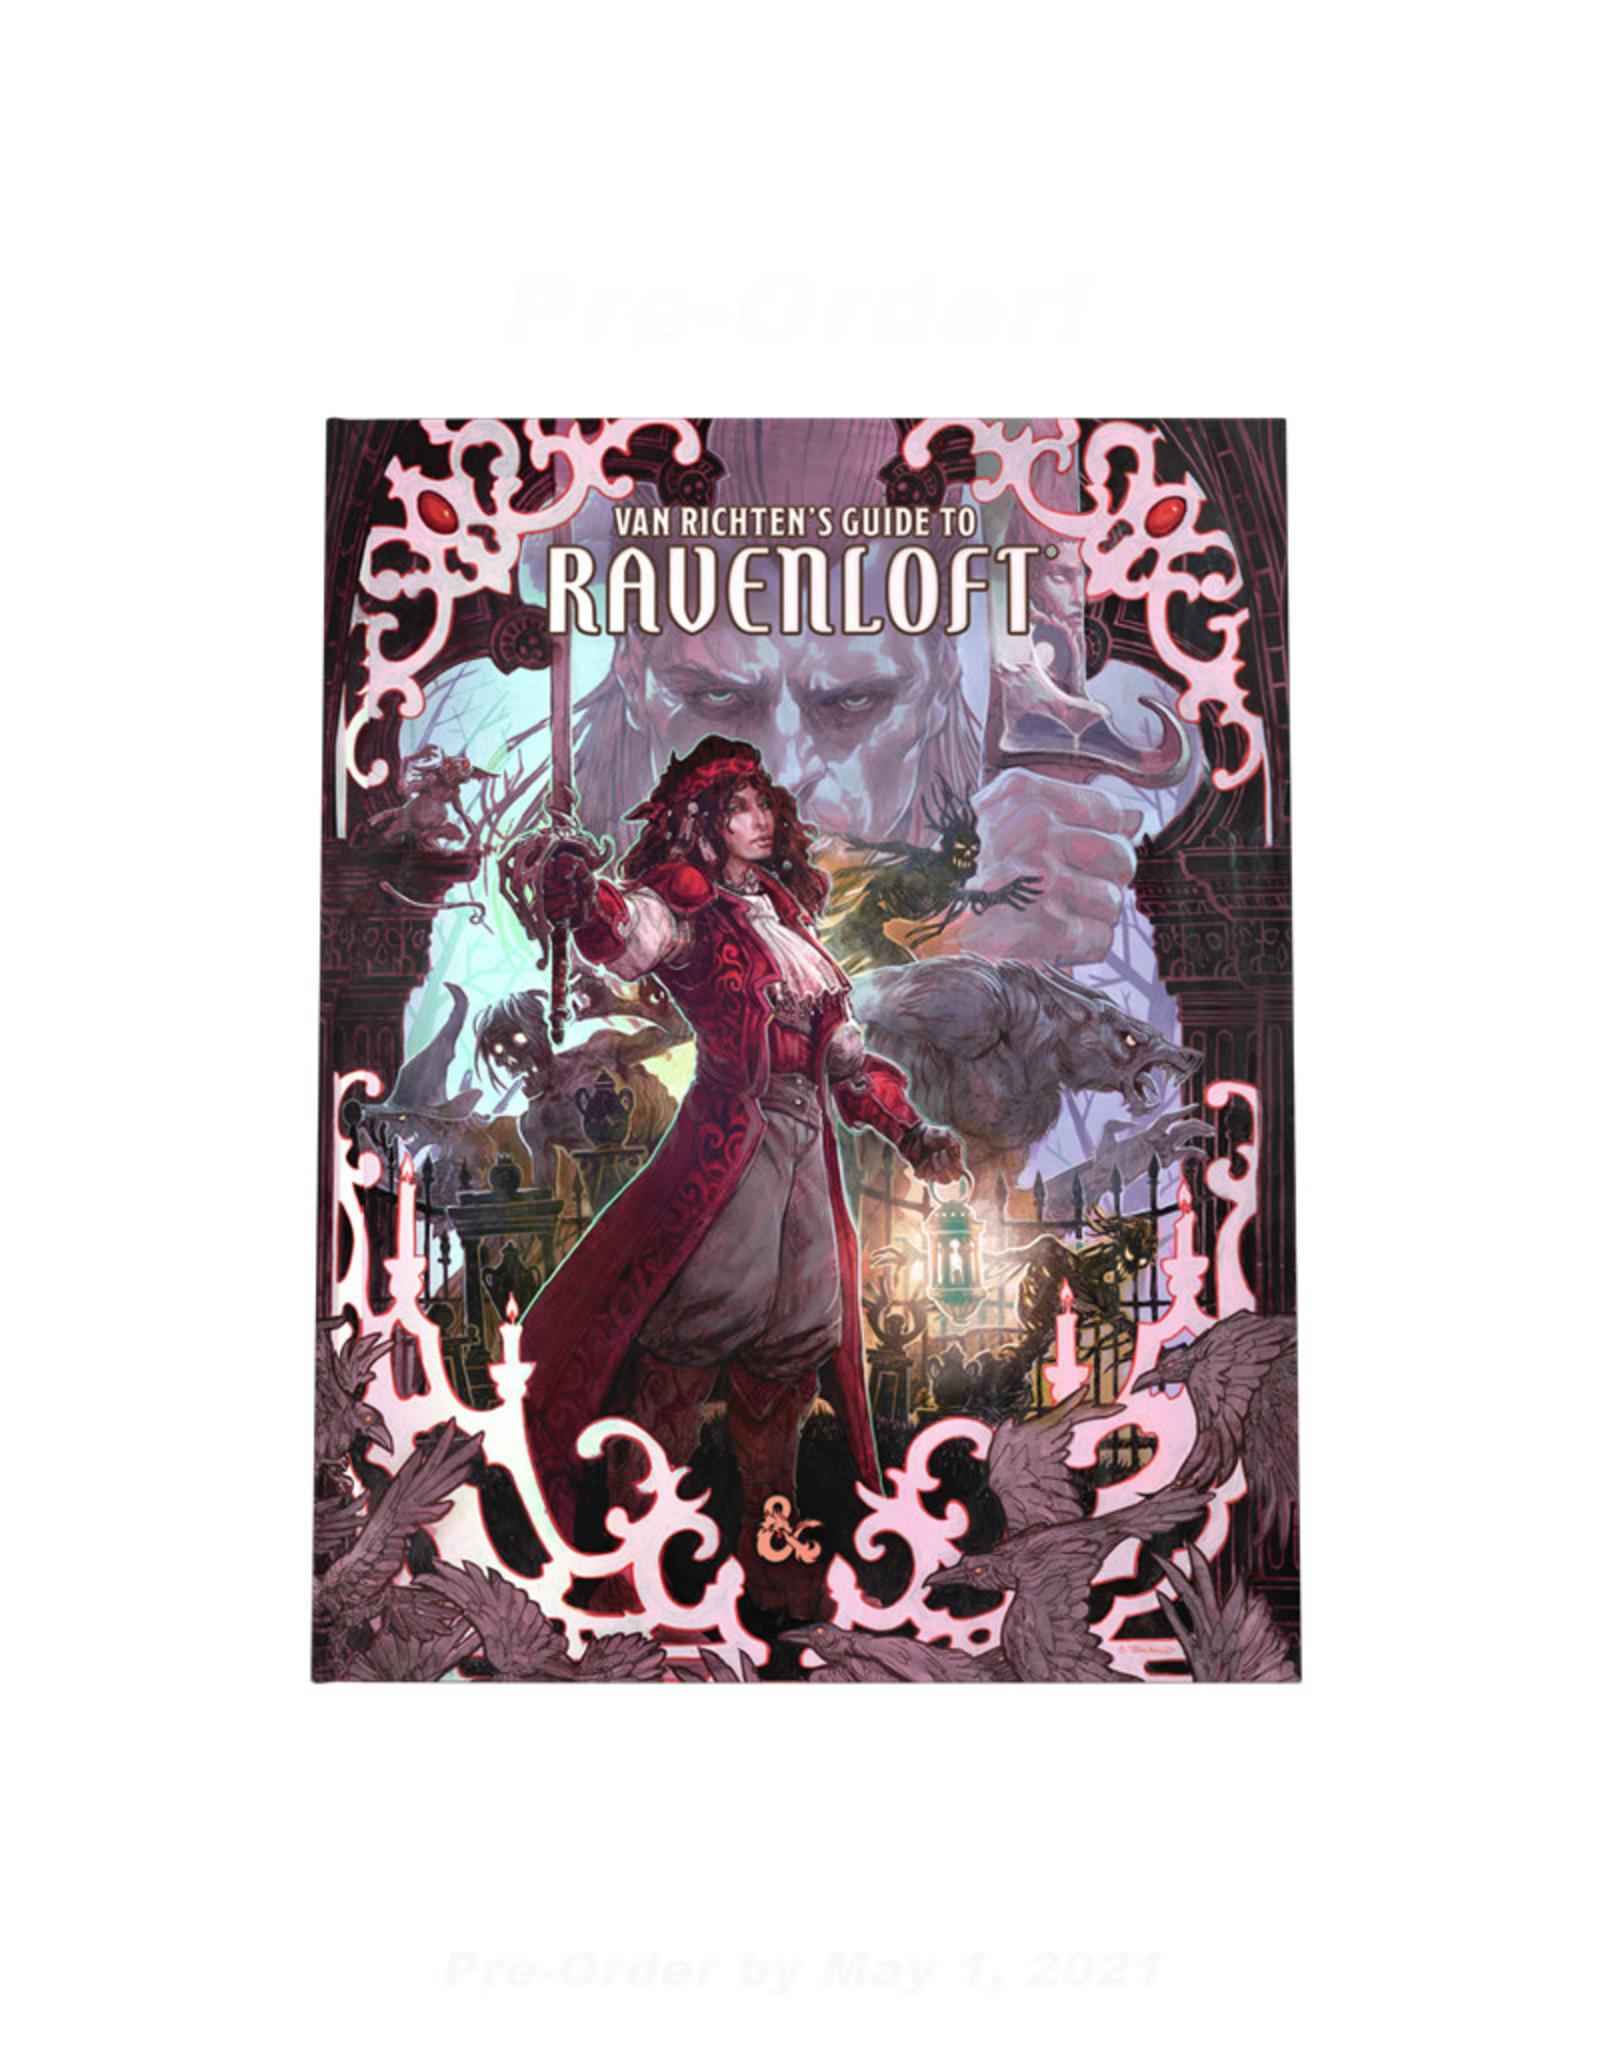 Wizards of the Coast D&D RPG: Van Richten's Guide to Ravenloft Alternate Art Cover (Pre-Order)